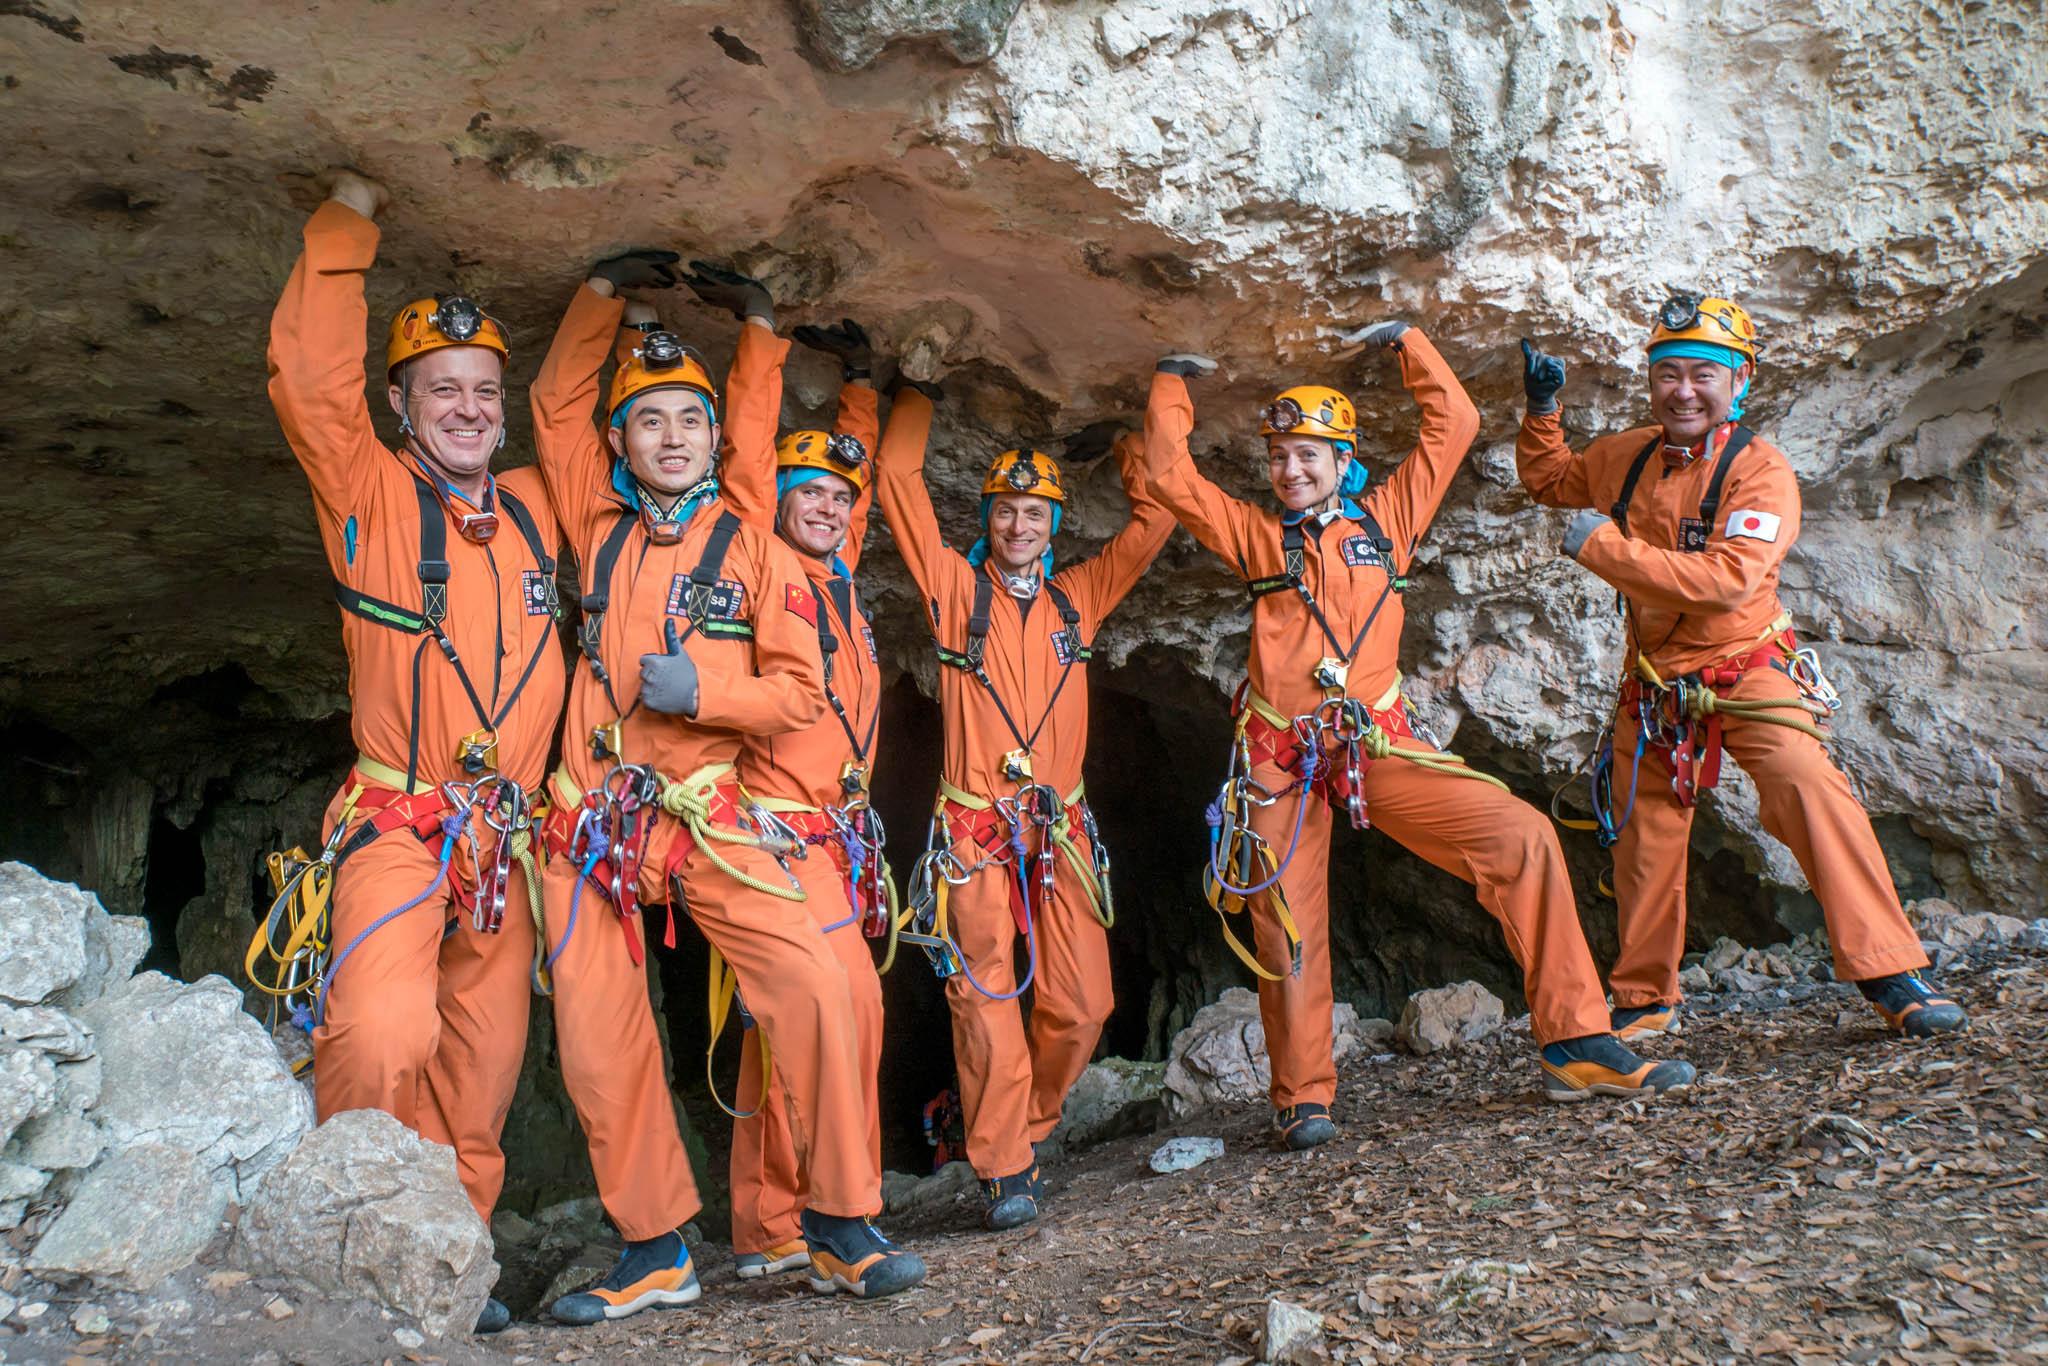 Last light before entering the caves. From left: Ricky Arnold, Ye Guangfu, Sergei Korsakov, Pedro Duque, Jessica Meir and Aki Hoshide. Credits: ESA–V. Crobu